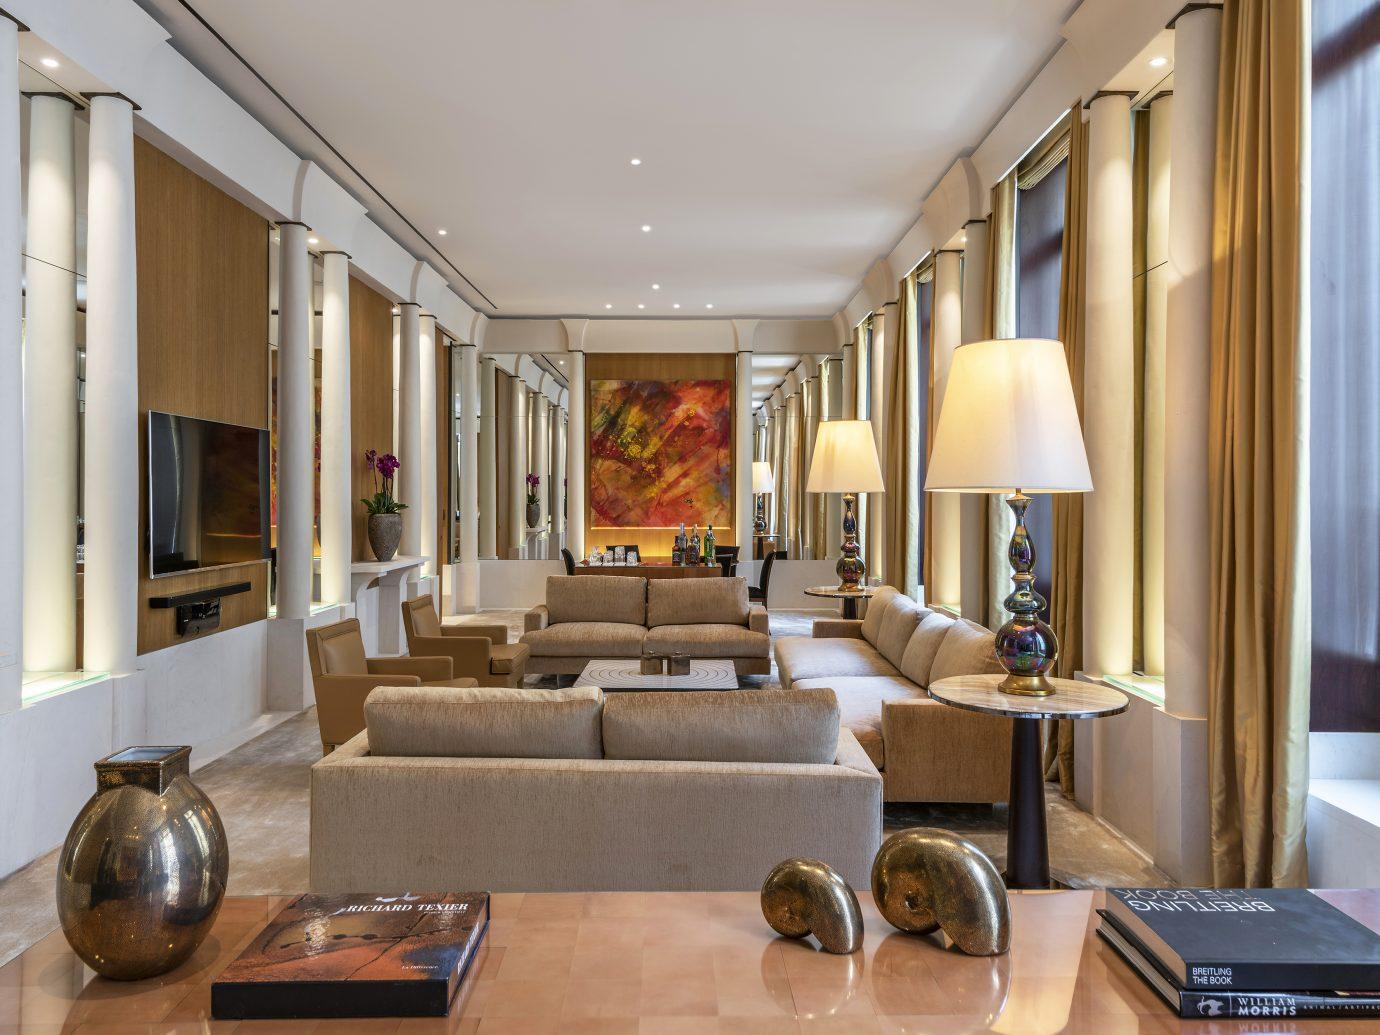 Living room of the Imperiale suite at Park Hyatt Paris Vendome